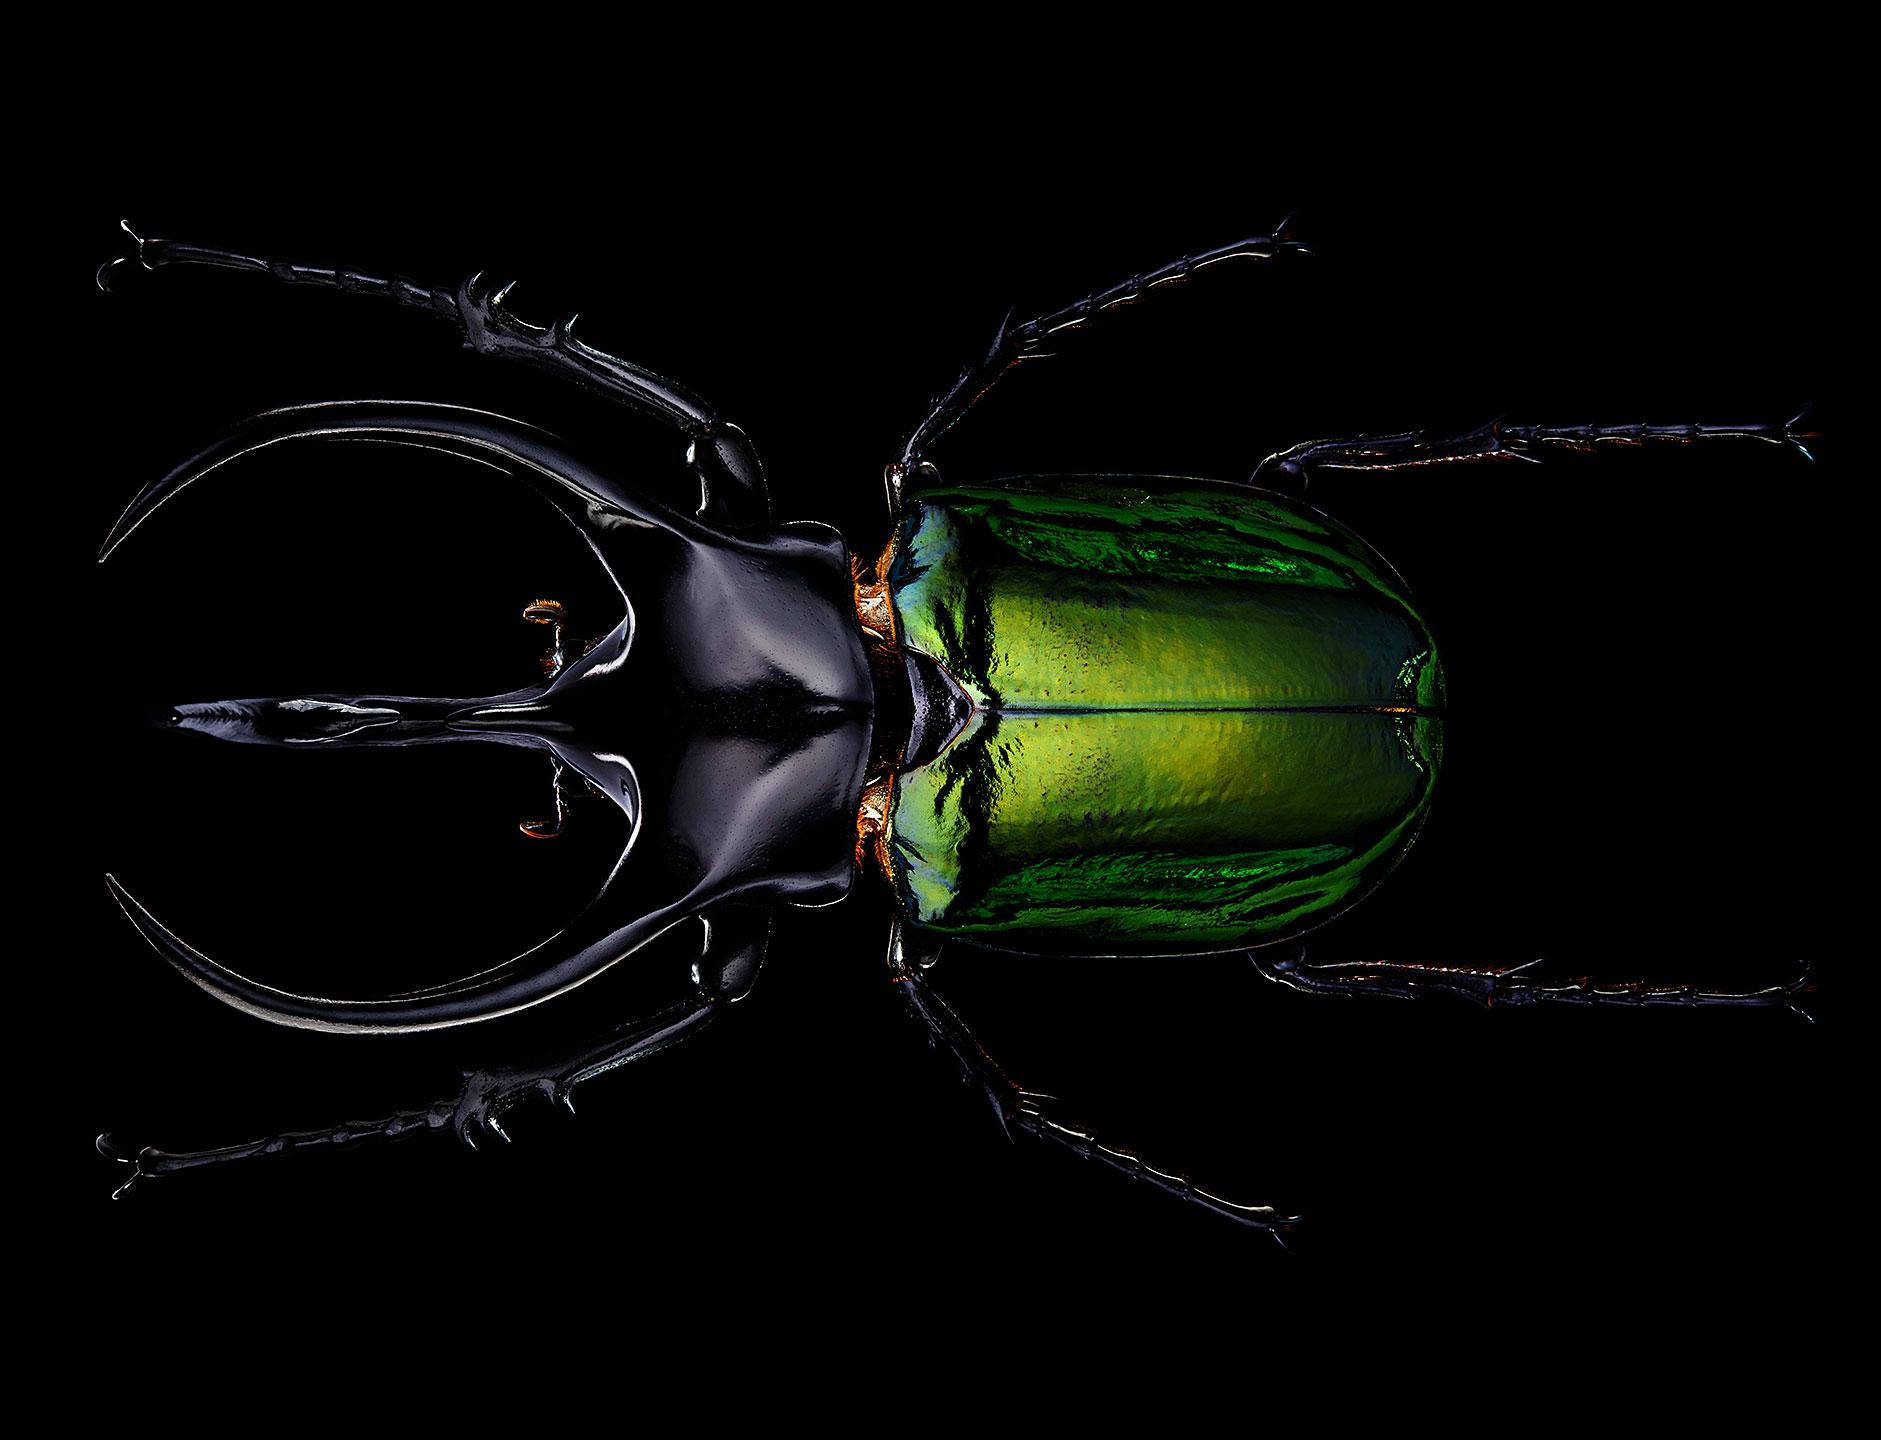 "<a href=""//mrsteel.london/shop/atlas-beetle/"">REVEAL DETAILS / BUY</a>"